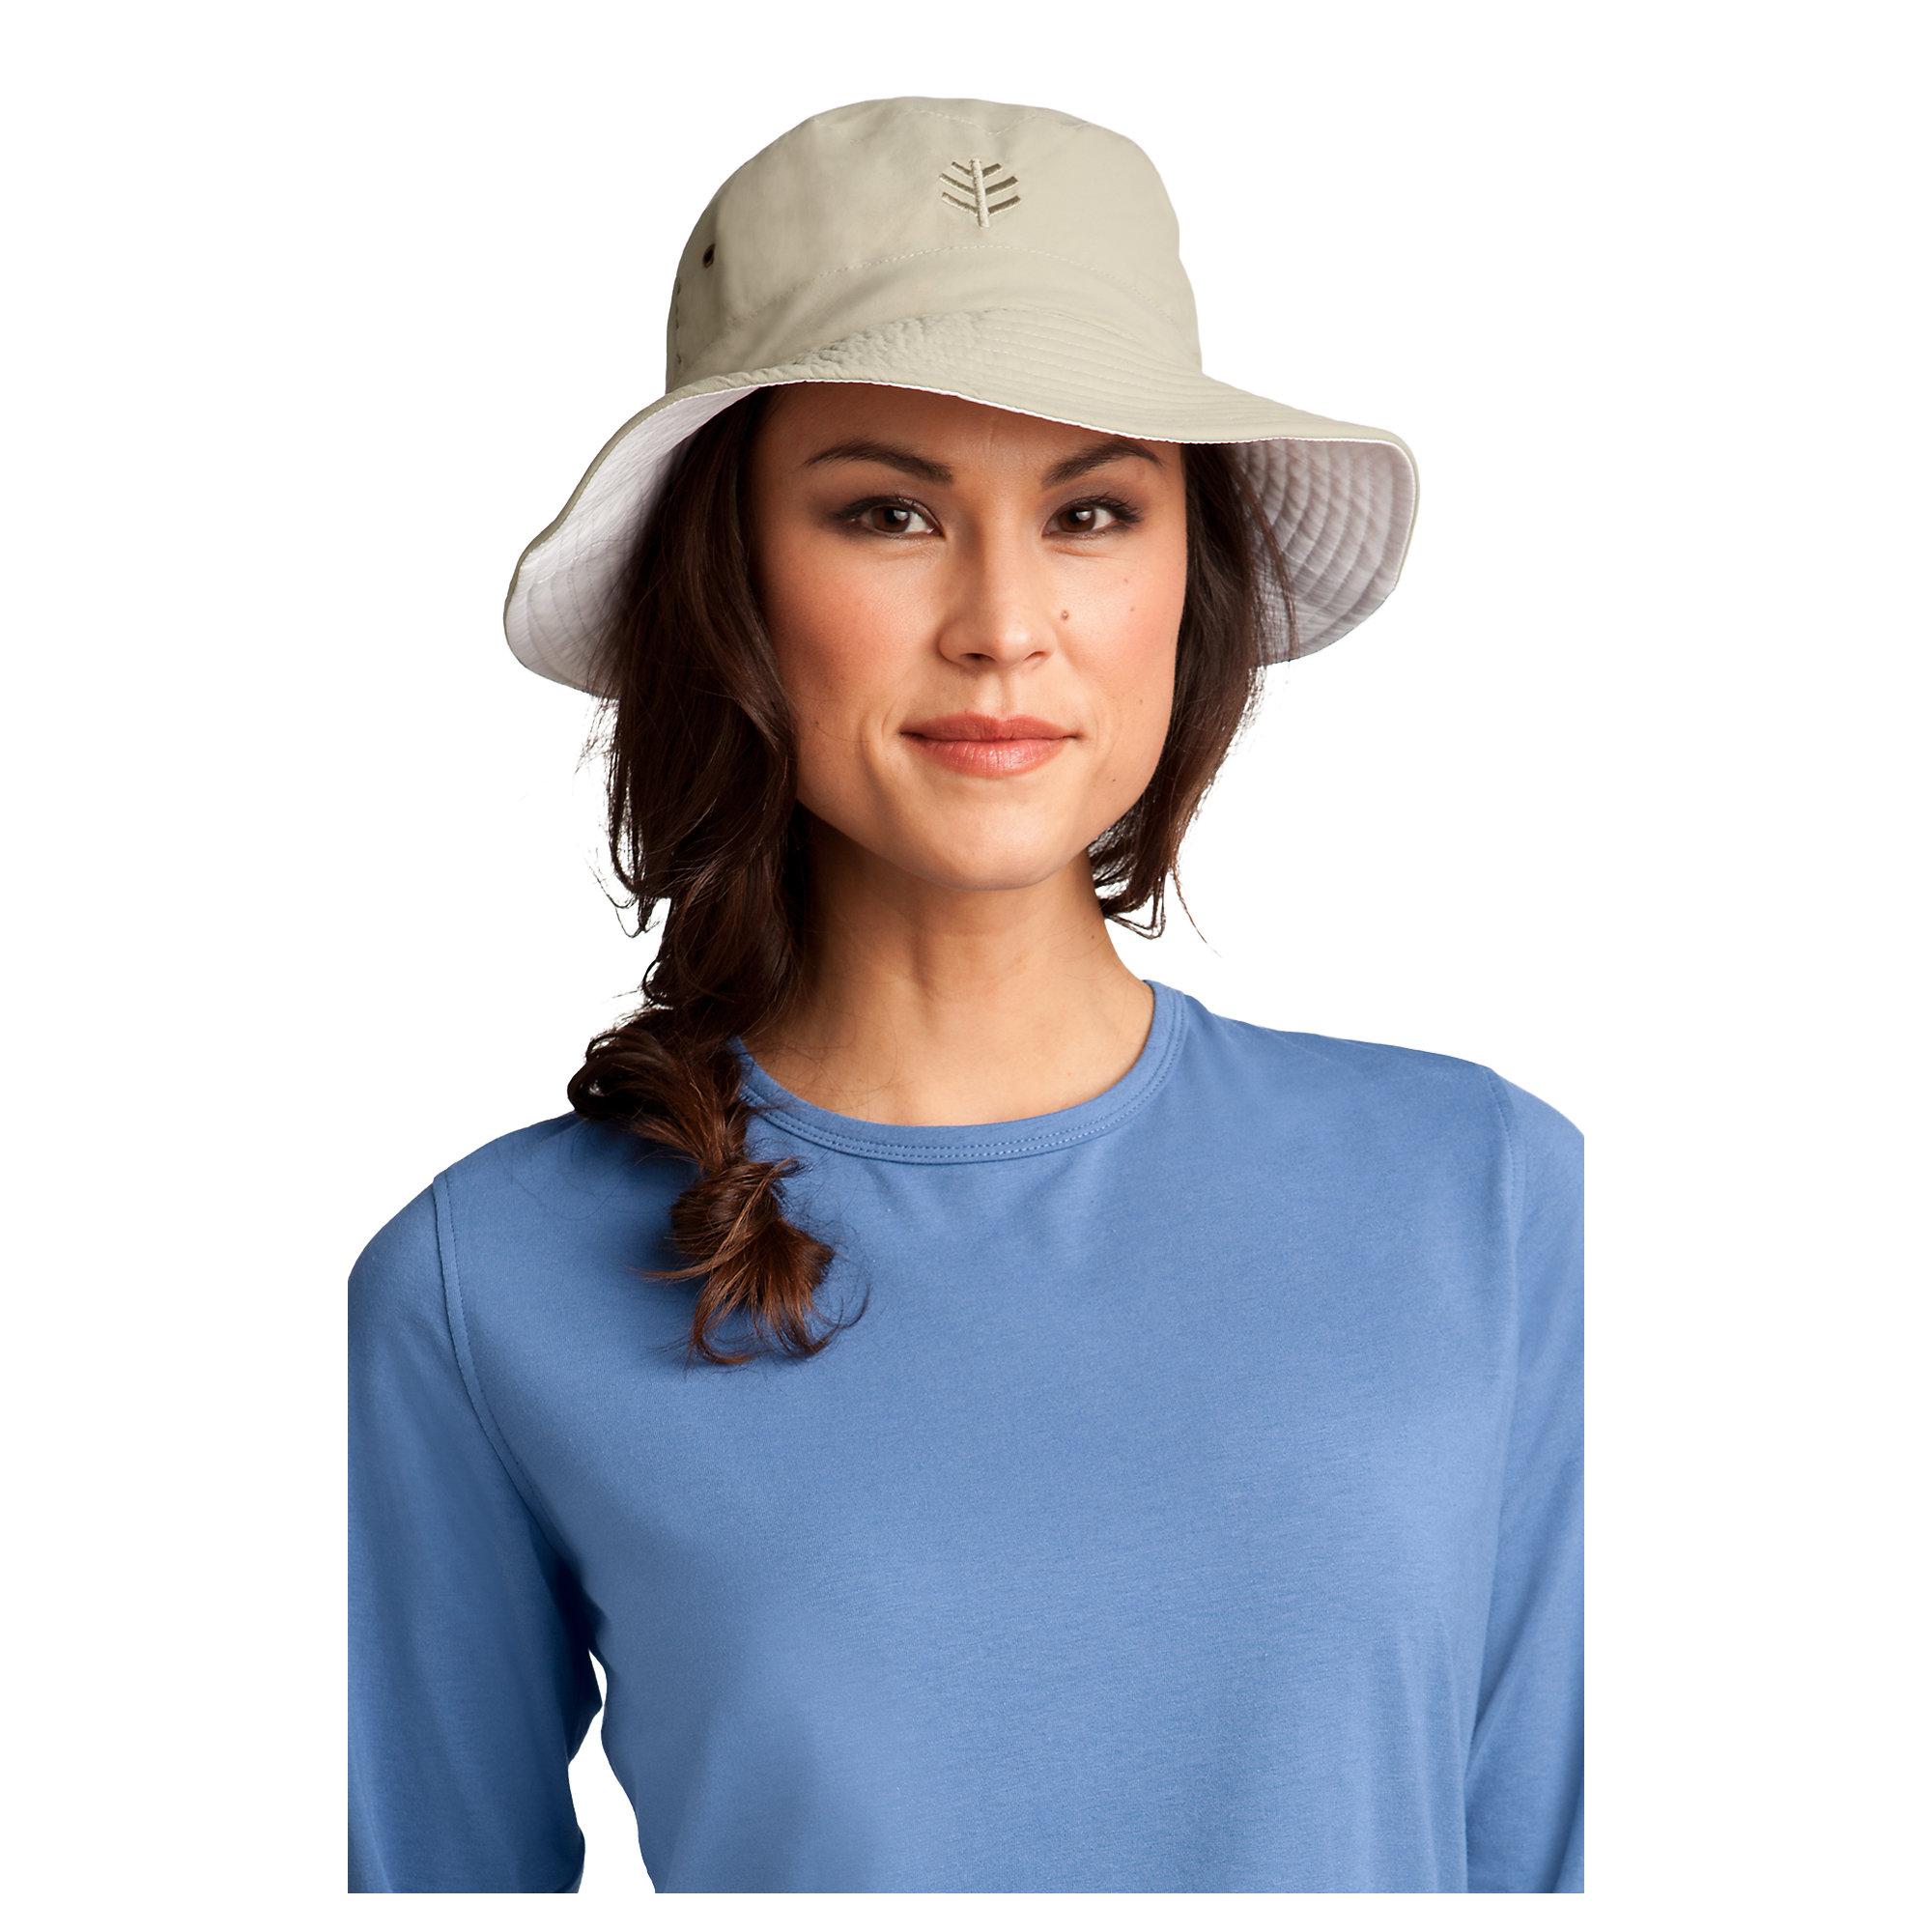 Coolibar UPF 50 Women's Reversible Bucket Hat   eBay